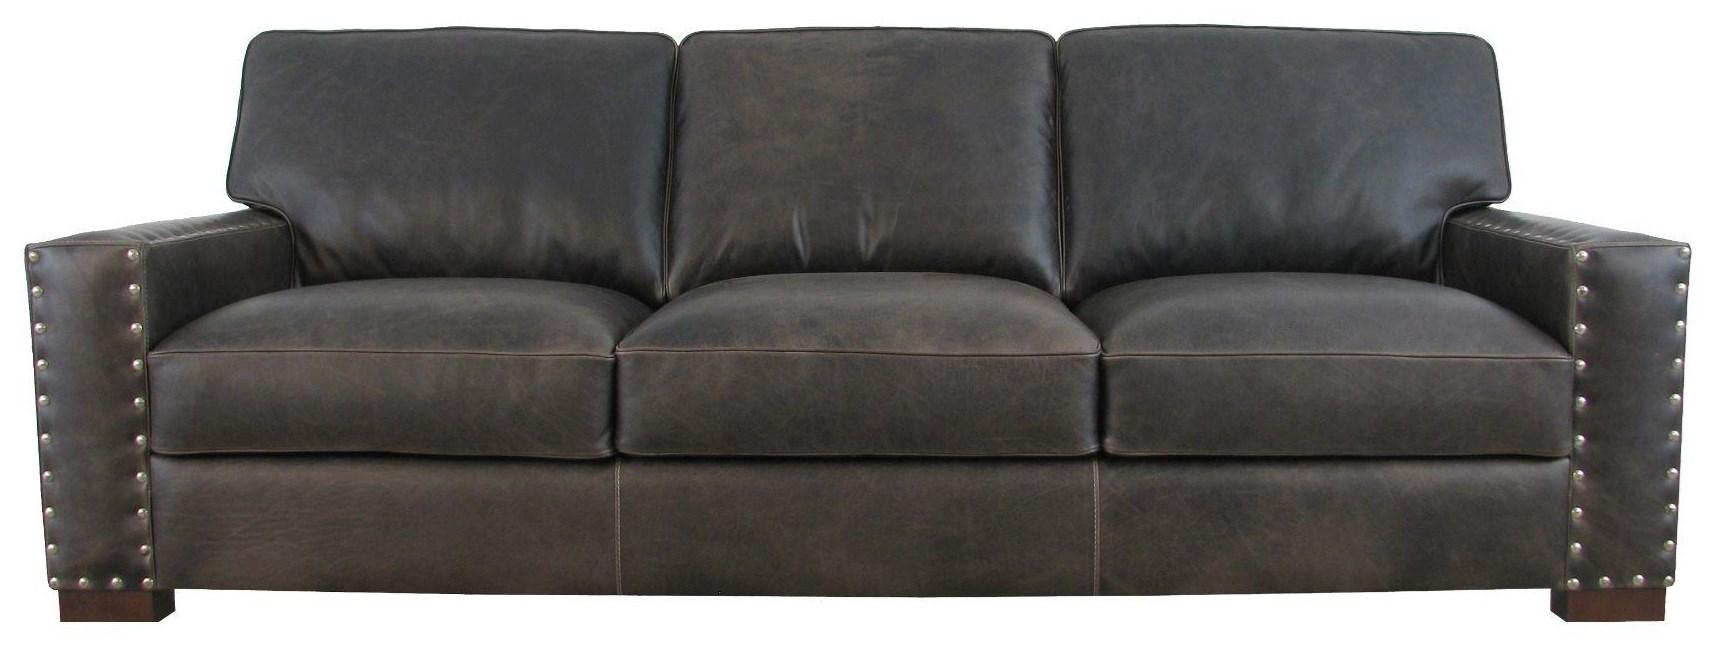 7594 Italian Leather Sofa by Giovanni Leather at Sprintz Furniture